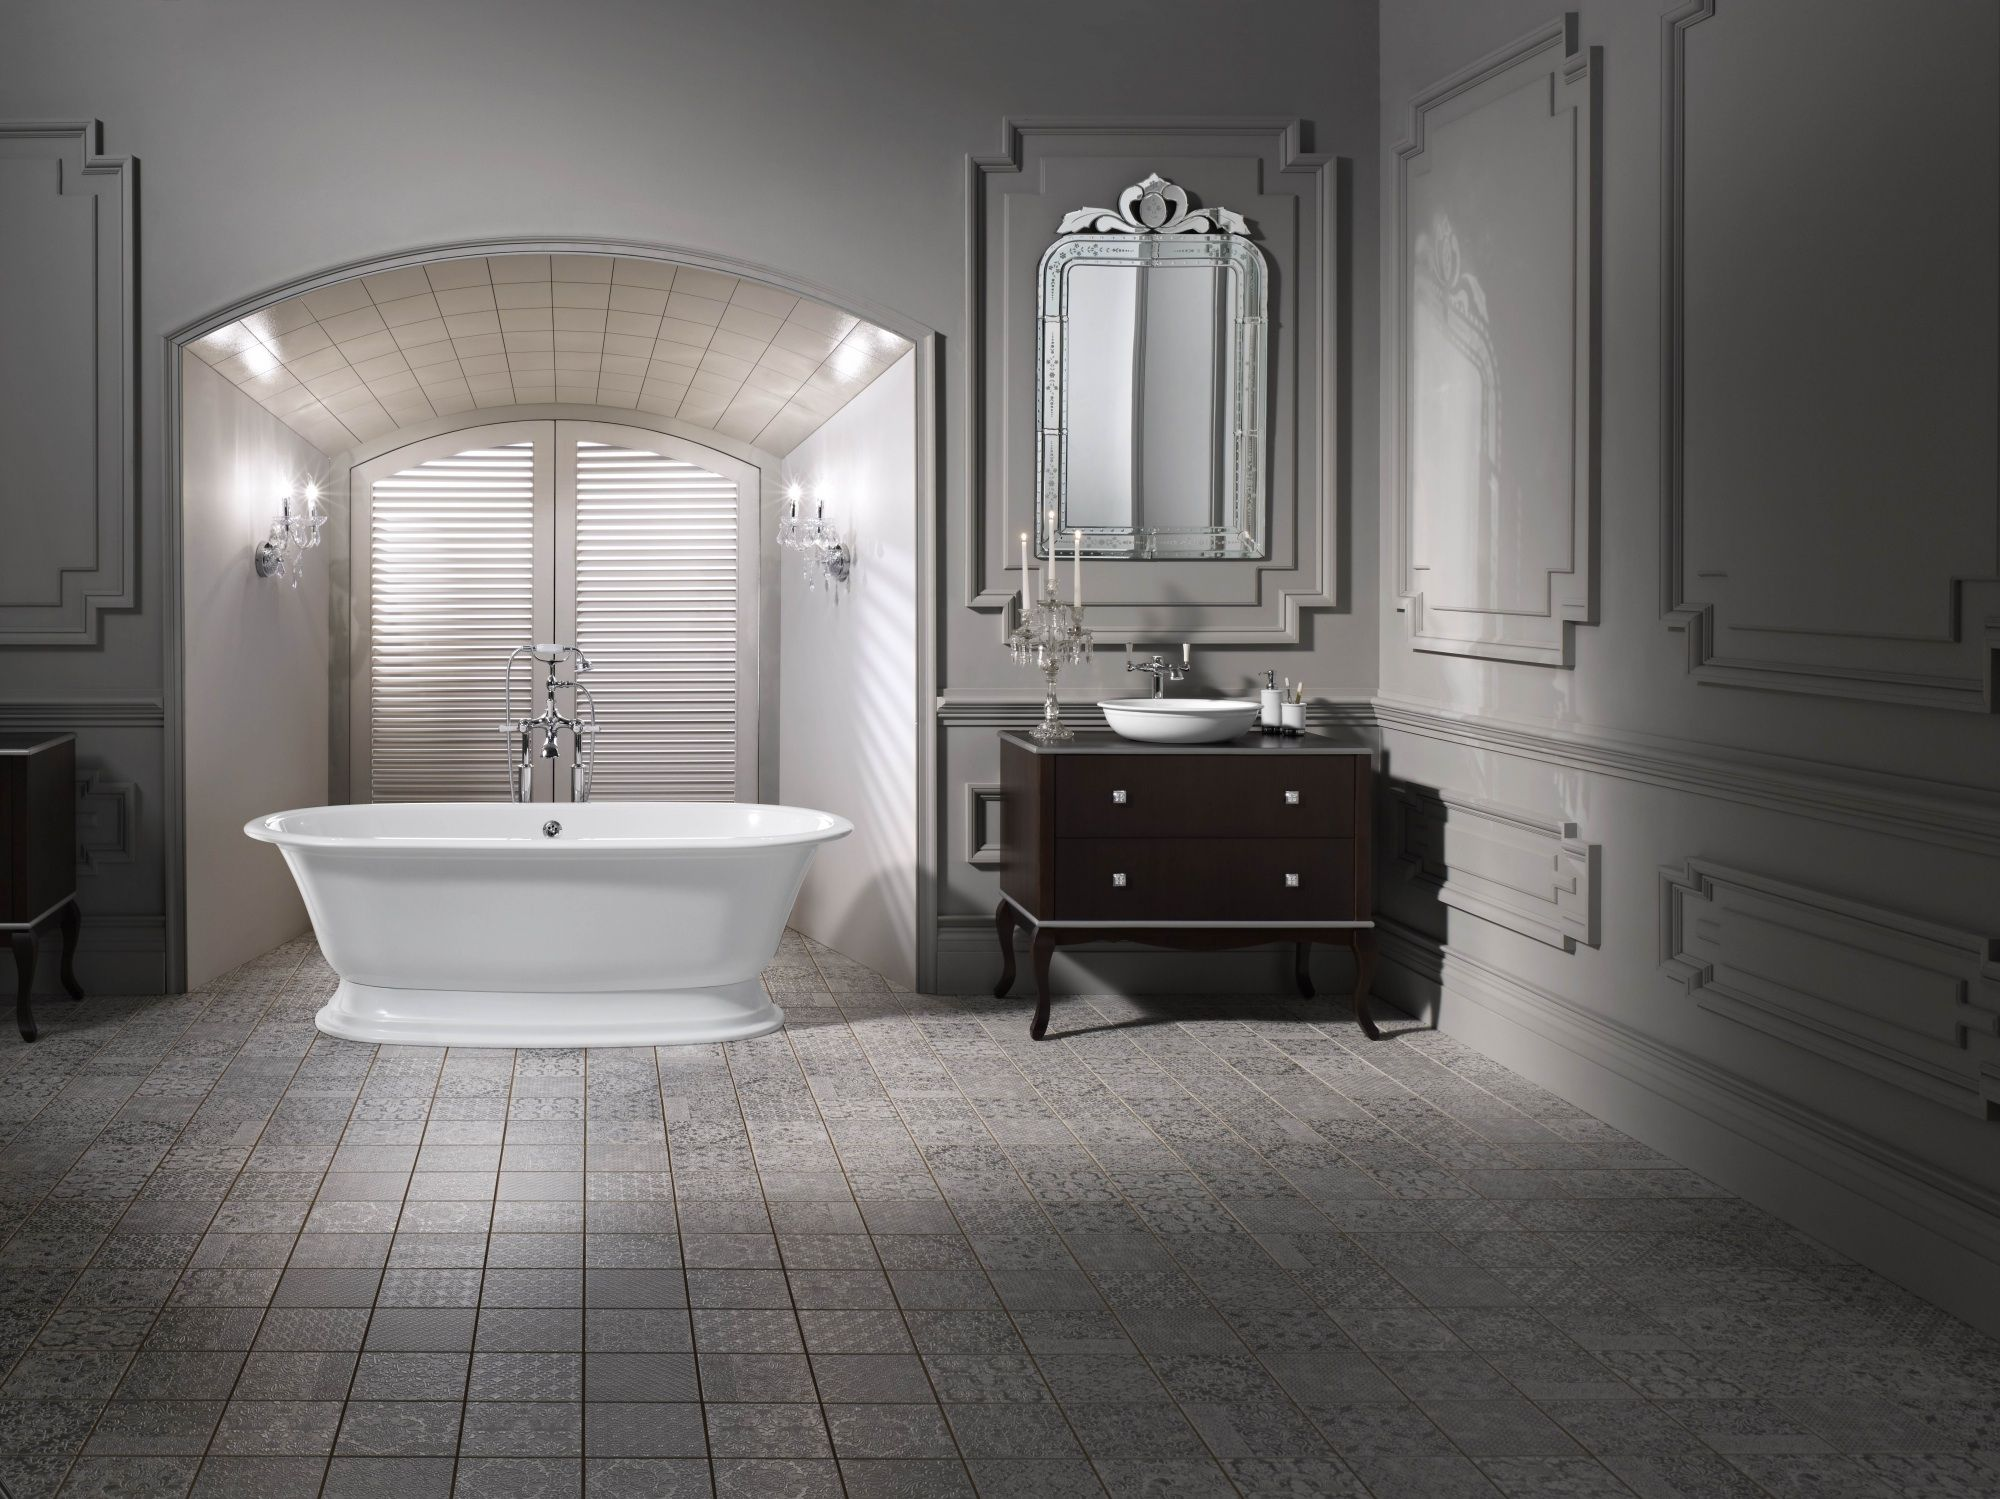 Vasca Da Bagno Tradizionale : Elwick vasche da bagno freestanding vasca da bagno